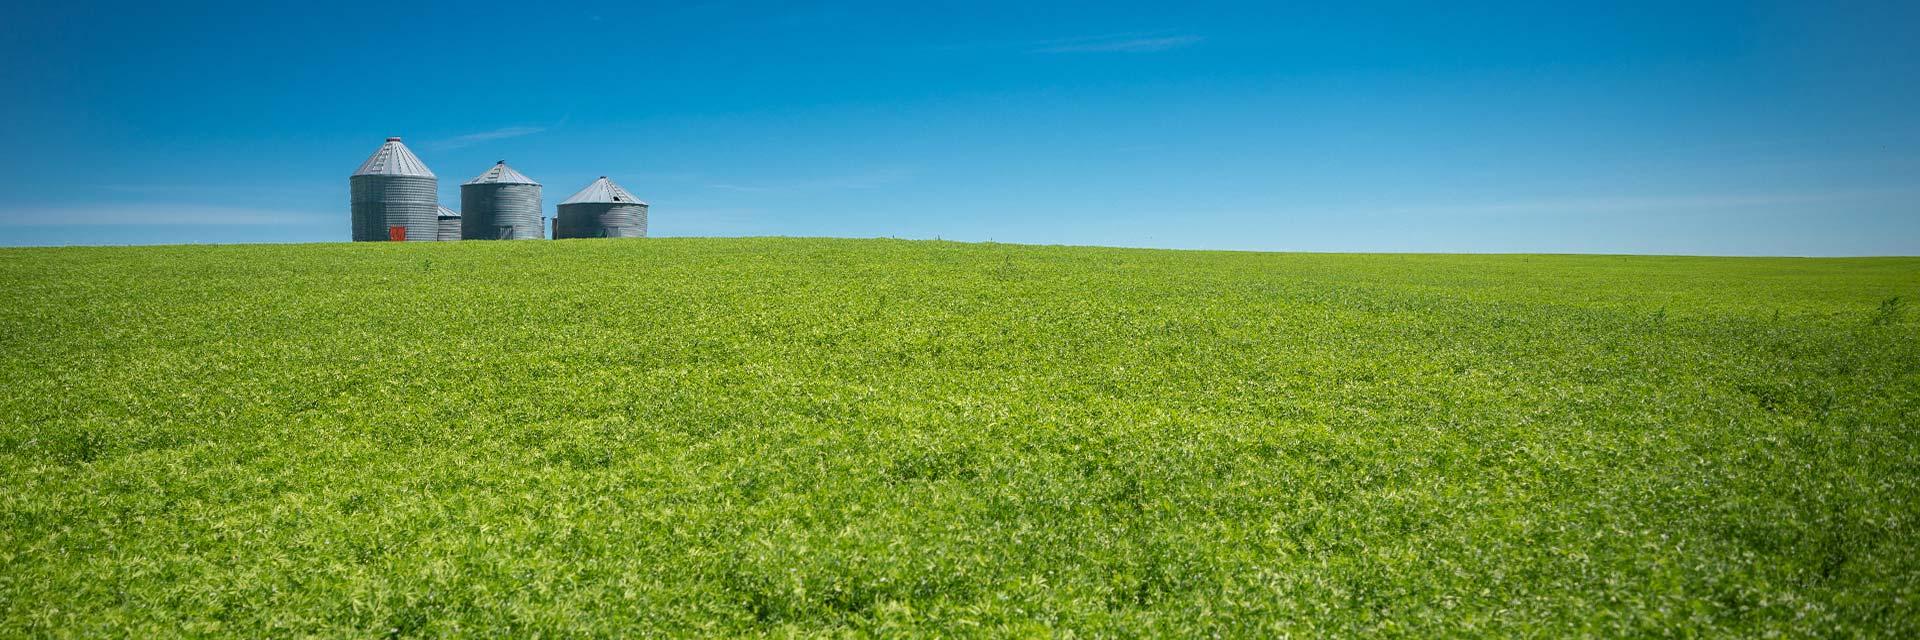 AGTIV crop rotation inoculants